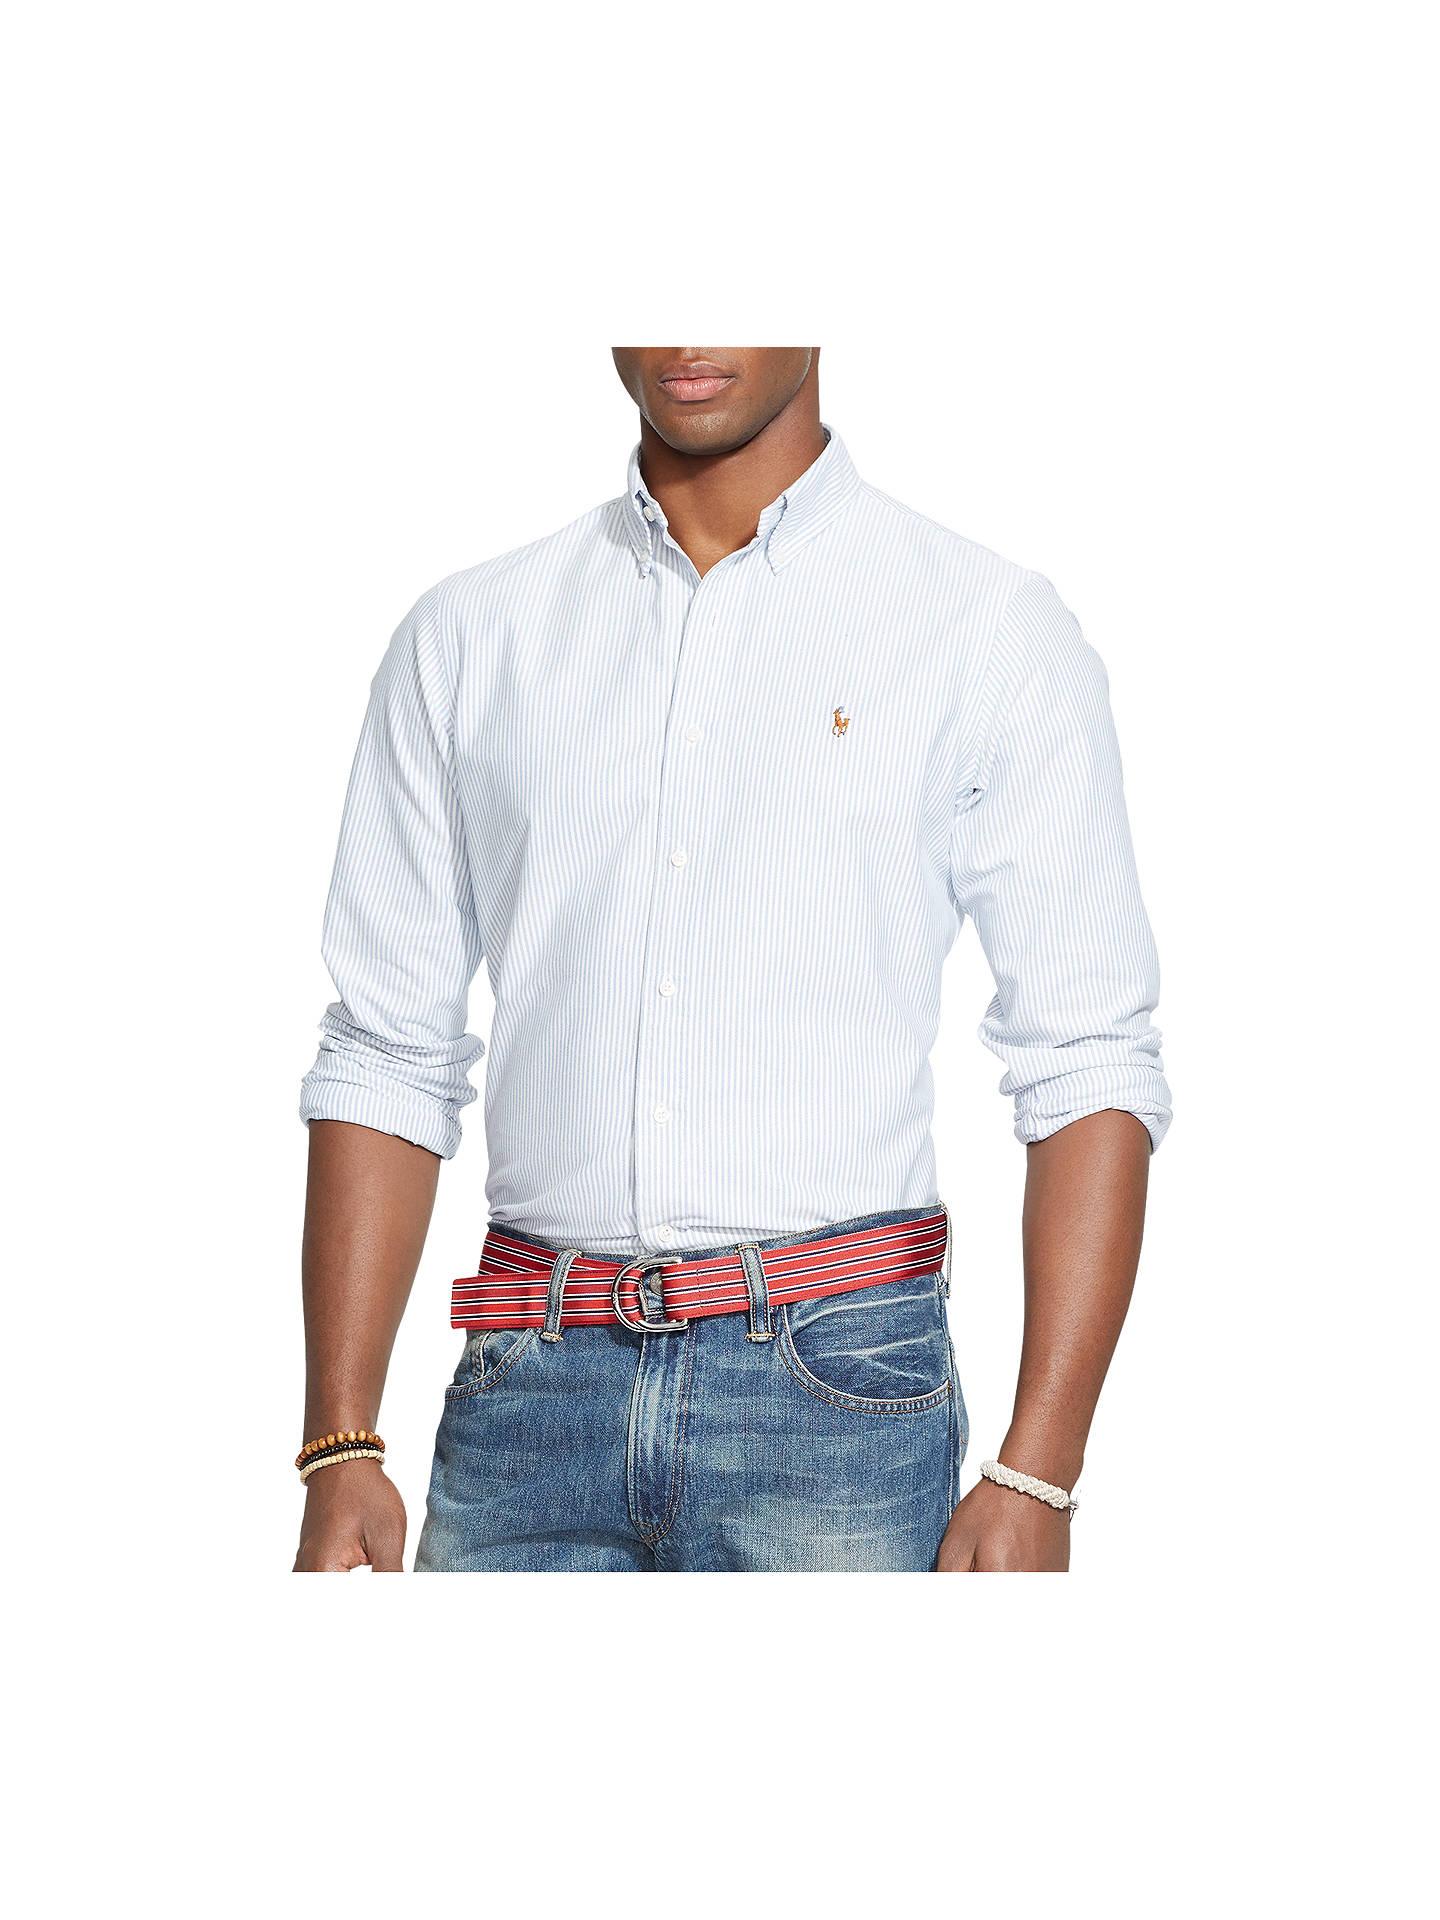 63a8e81ab72b BuyPolo Ralph Lauren Striped Oxford Shirt,, Blue White, S Online at  johnlewis ...